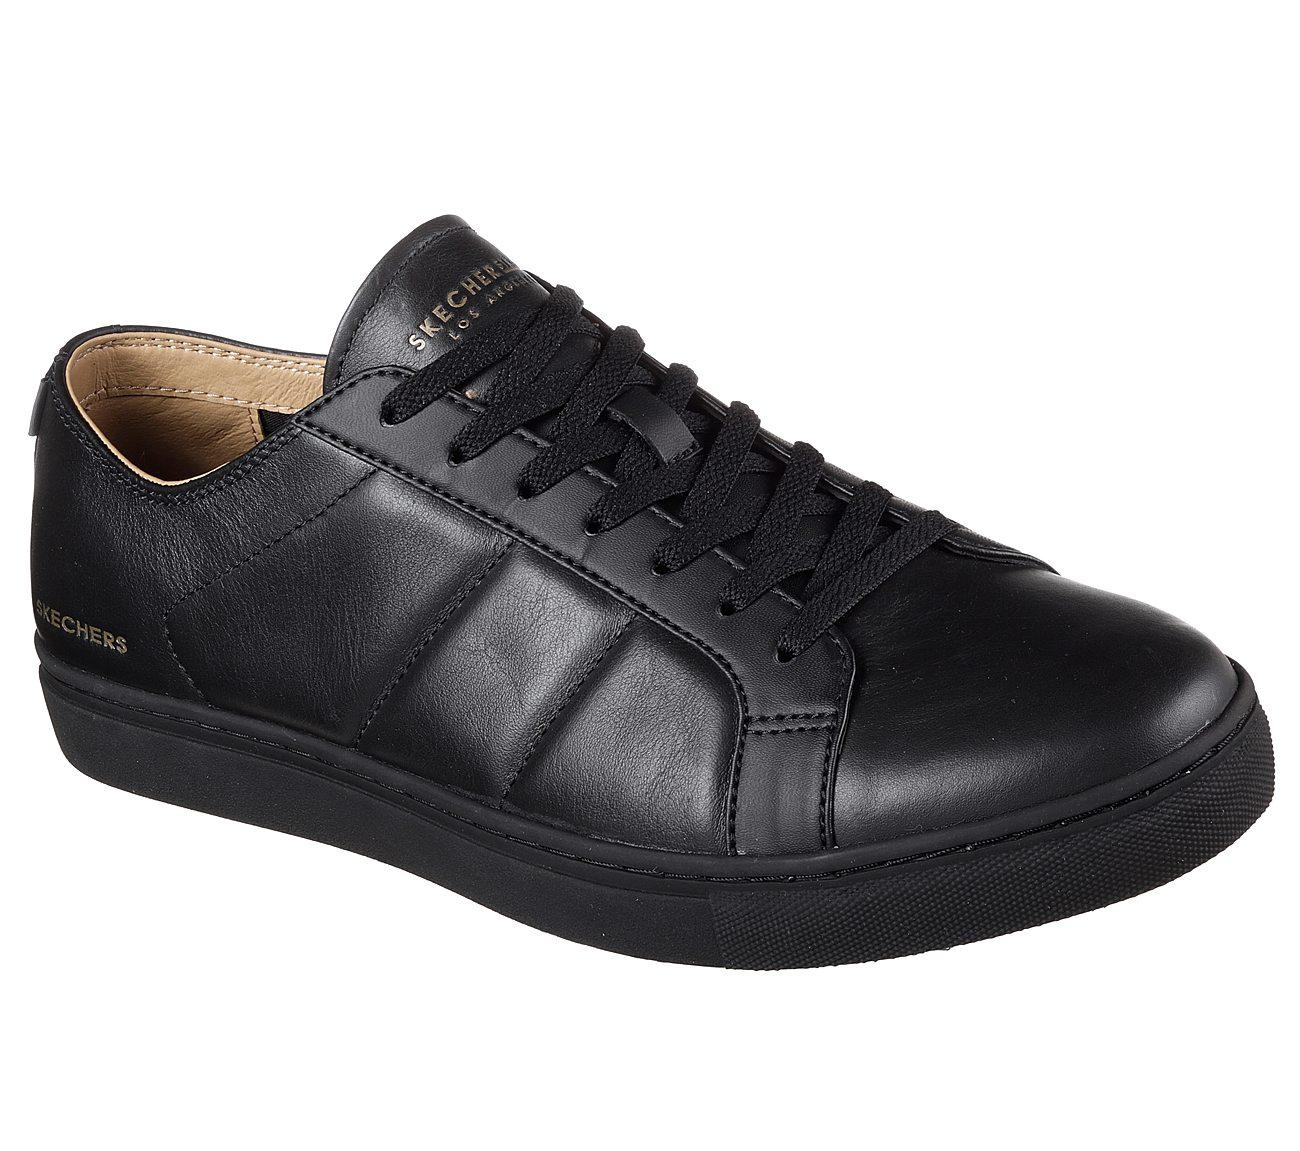 b3528e37b68 Buy SKECHERS Venice Sport Shoes only  90.00